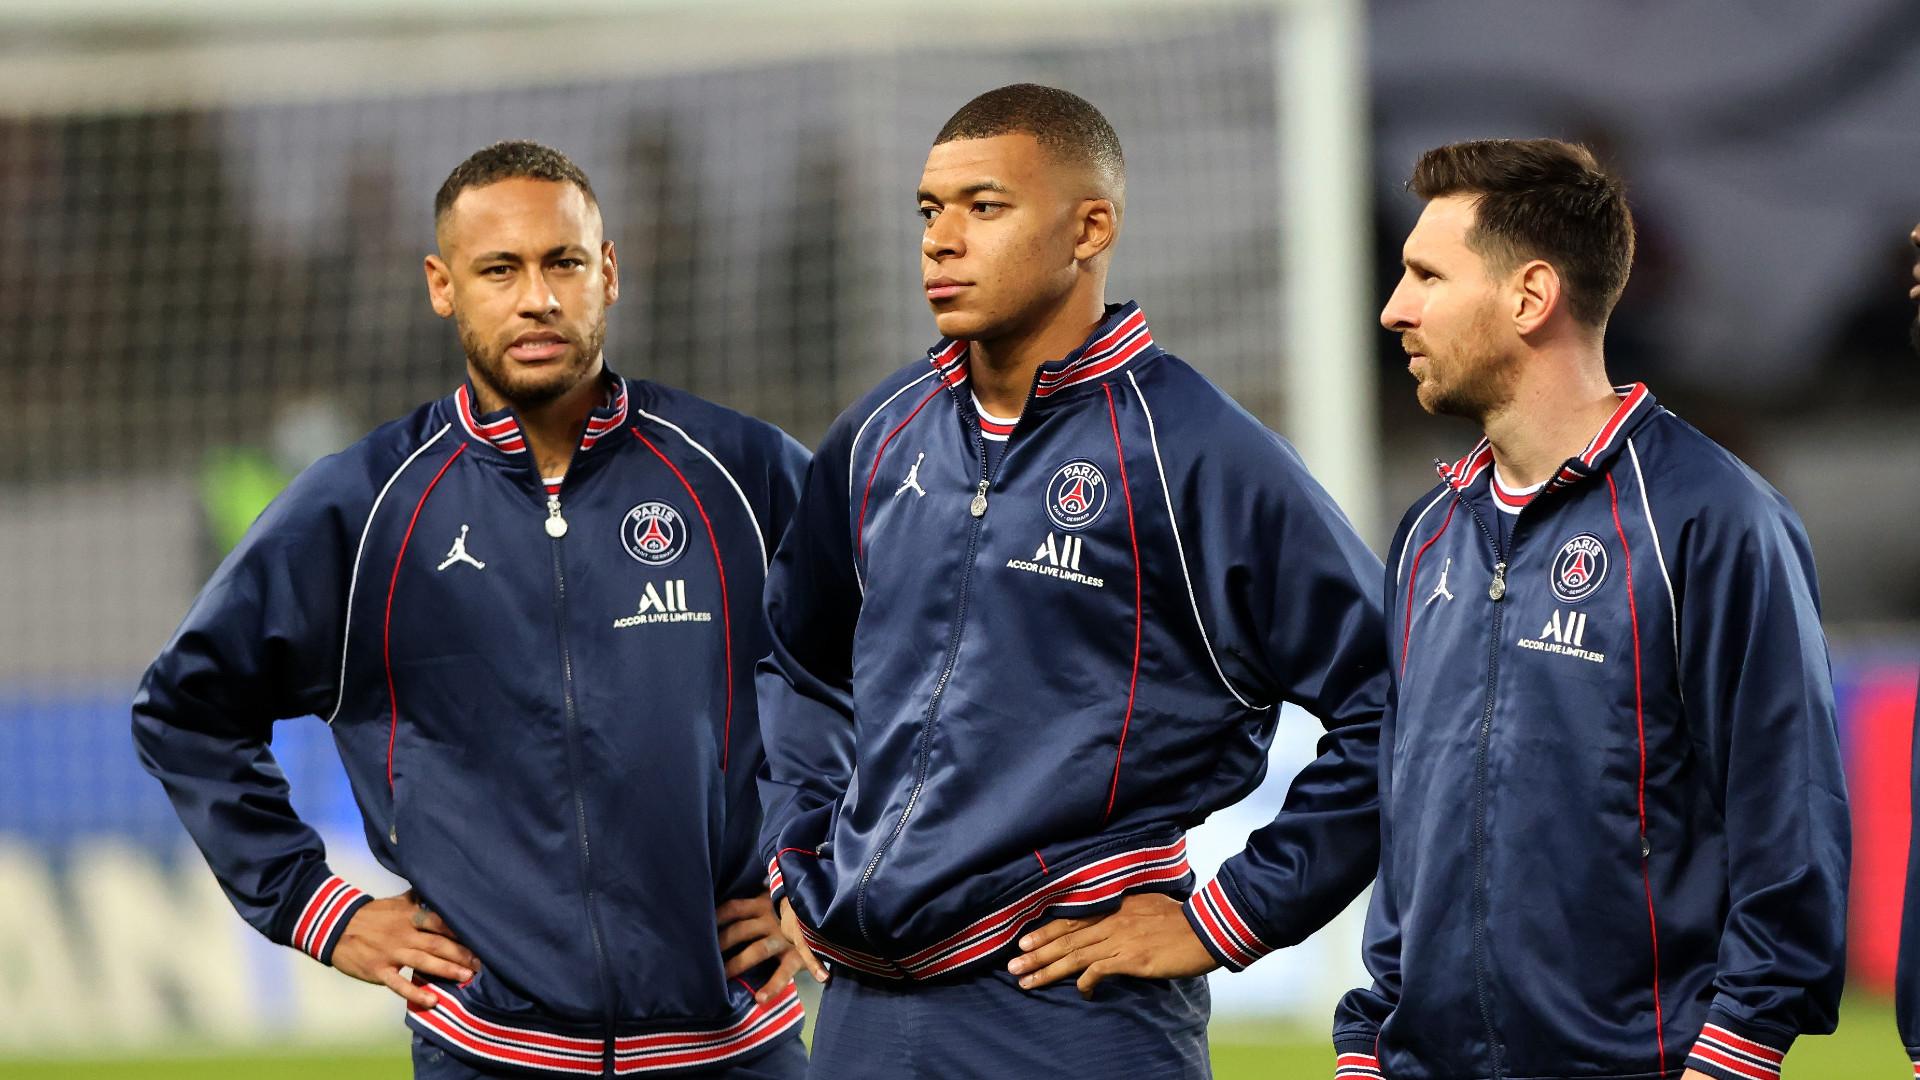 PSG Paris Saint Germain Neymar Messi Mbappe